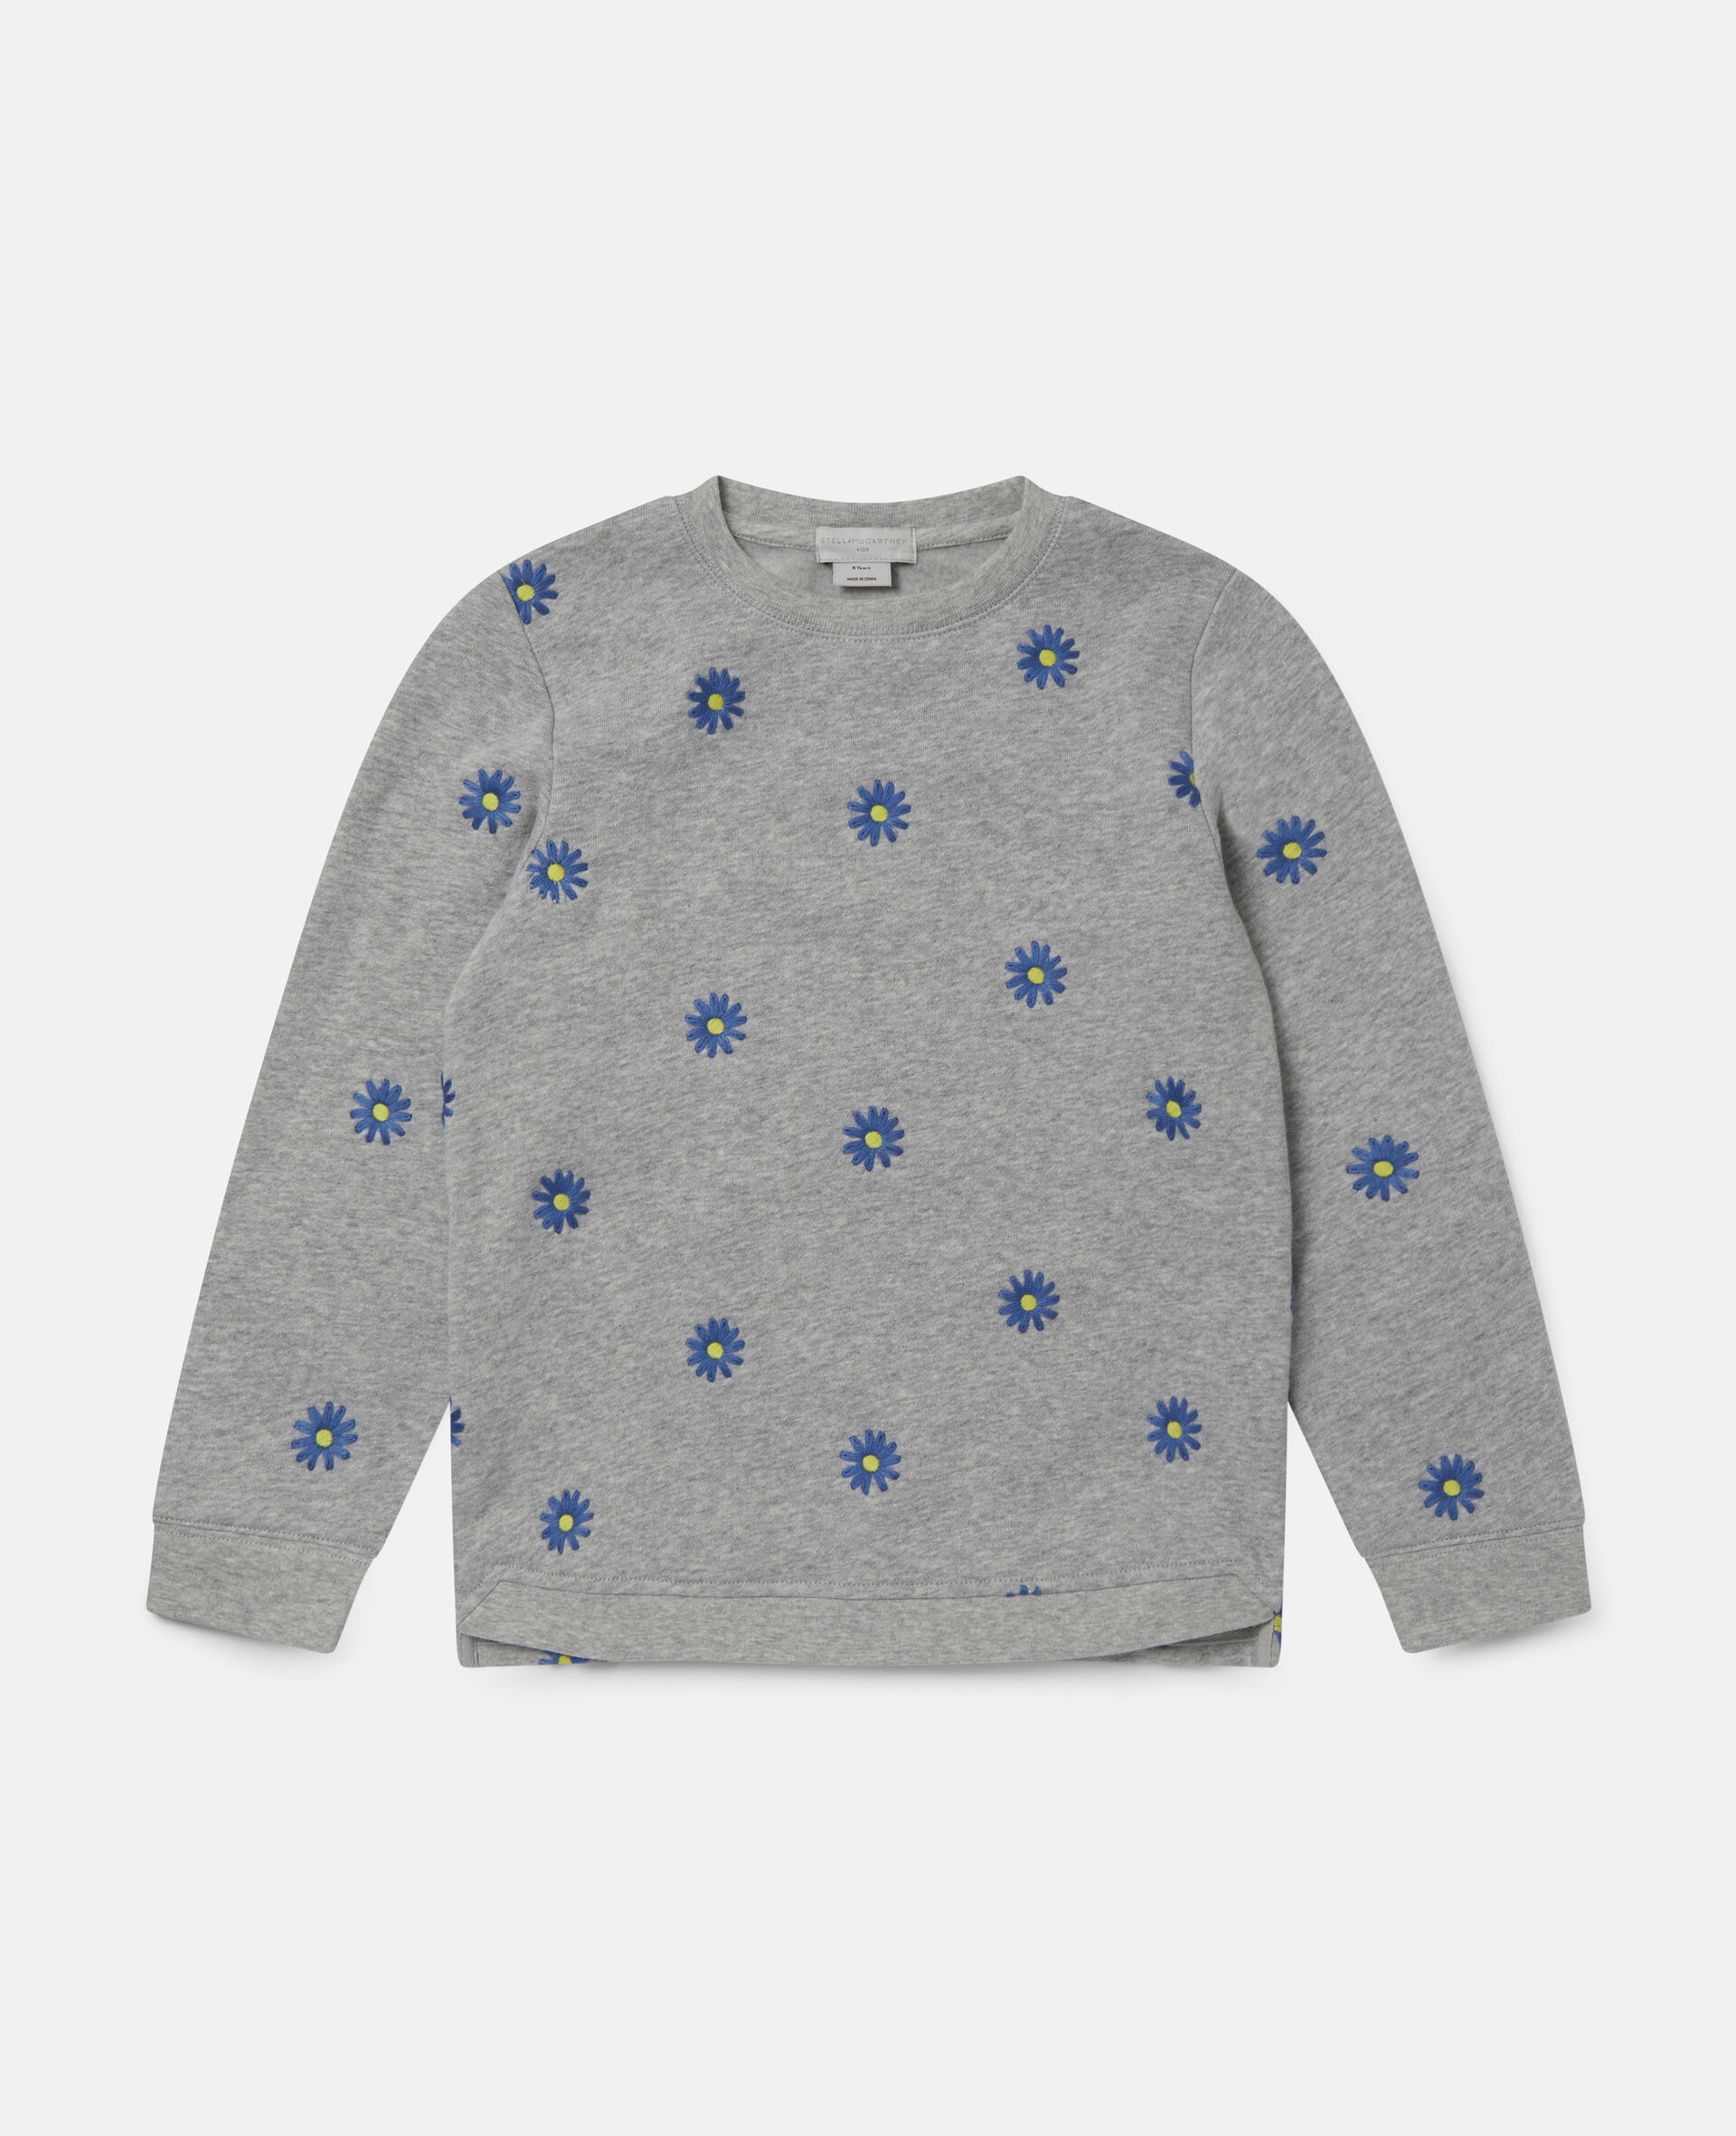 Embroidered Daisies Cotton Fleece Sweatshirt -Grey-large image number 0